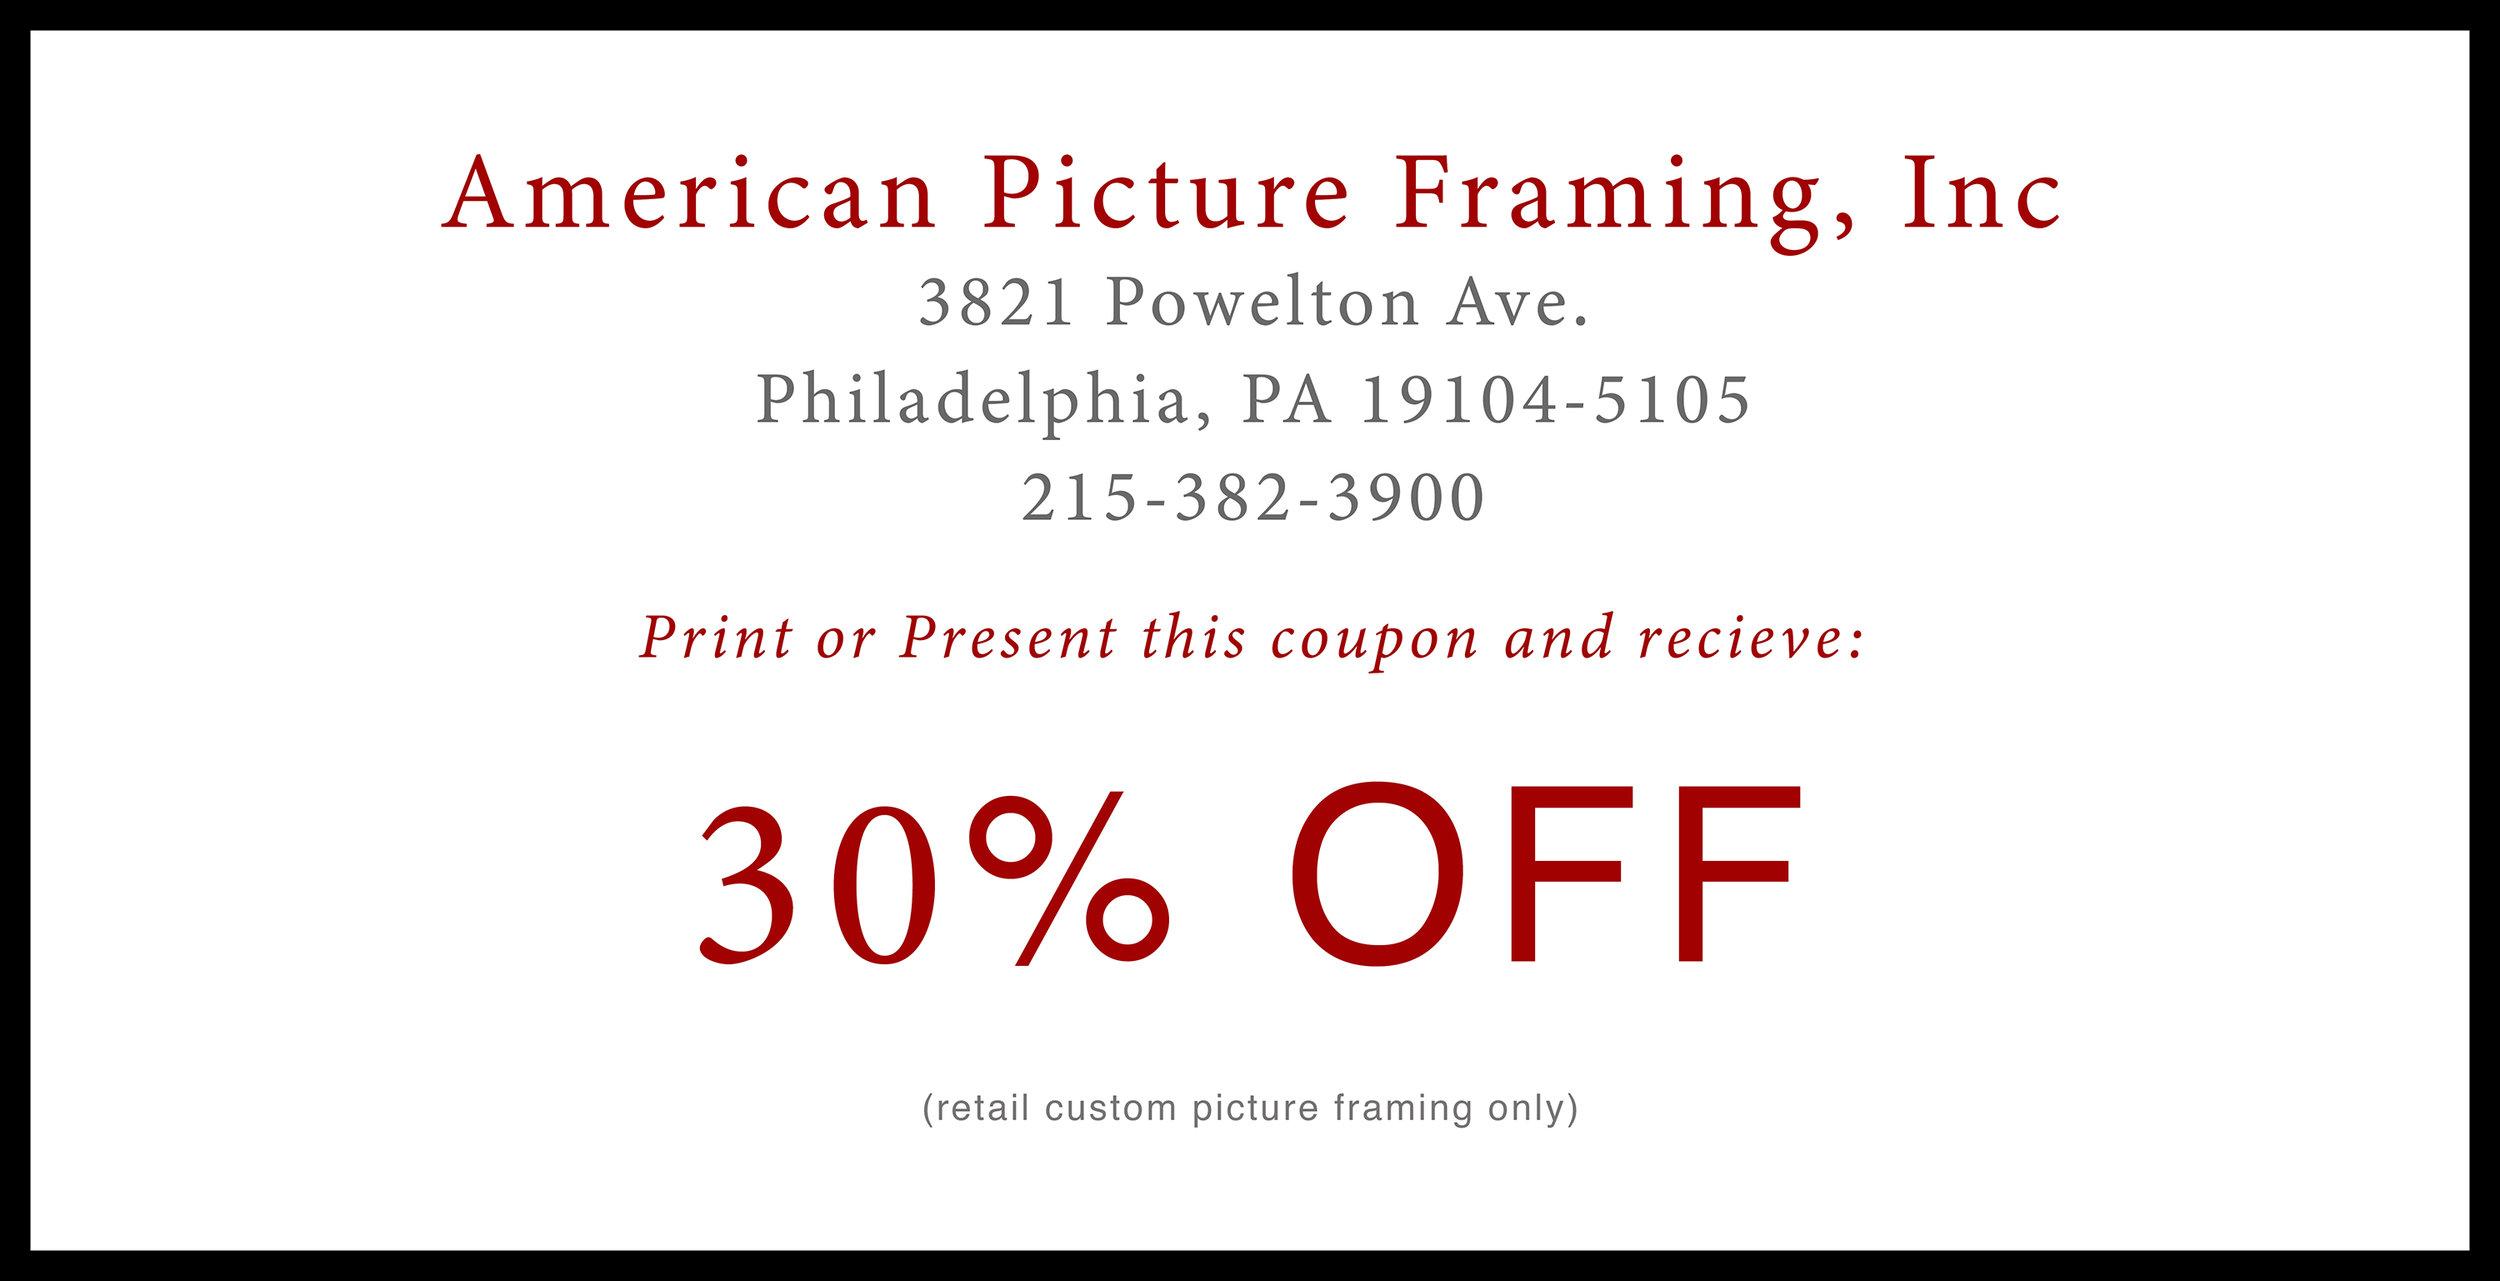 ampf coupon.jpg